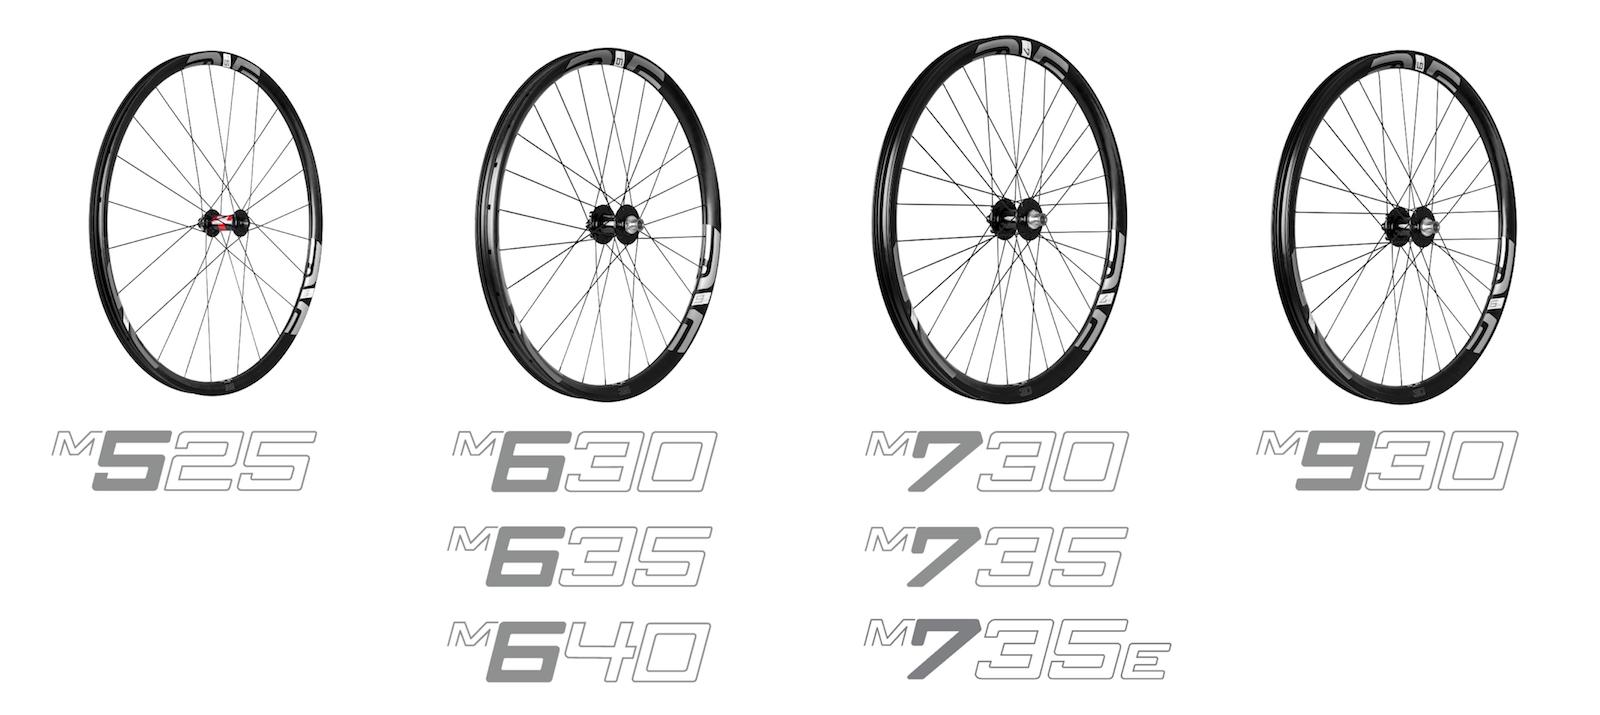 MTB-MAG COM - Mountain Bike Magazine | ENVE releases second